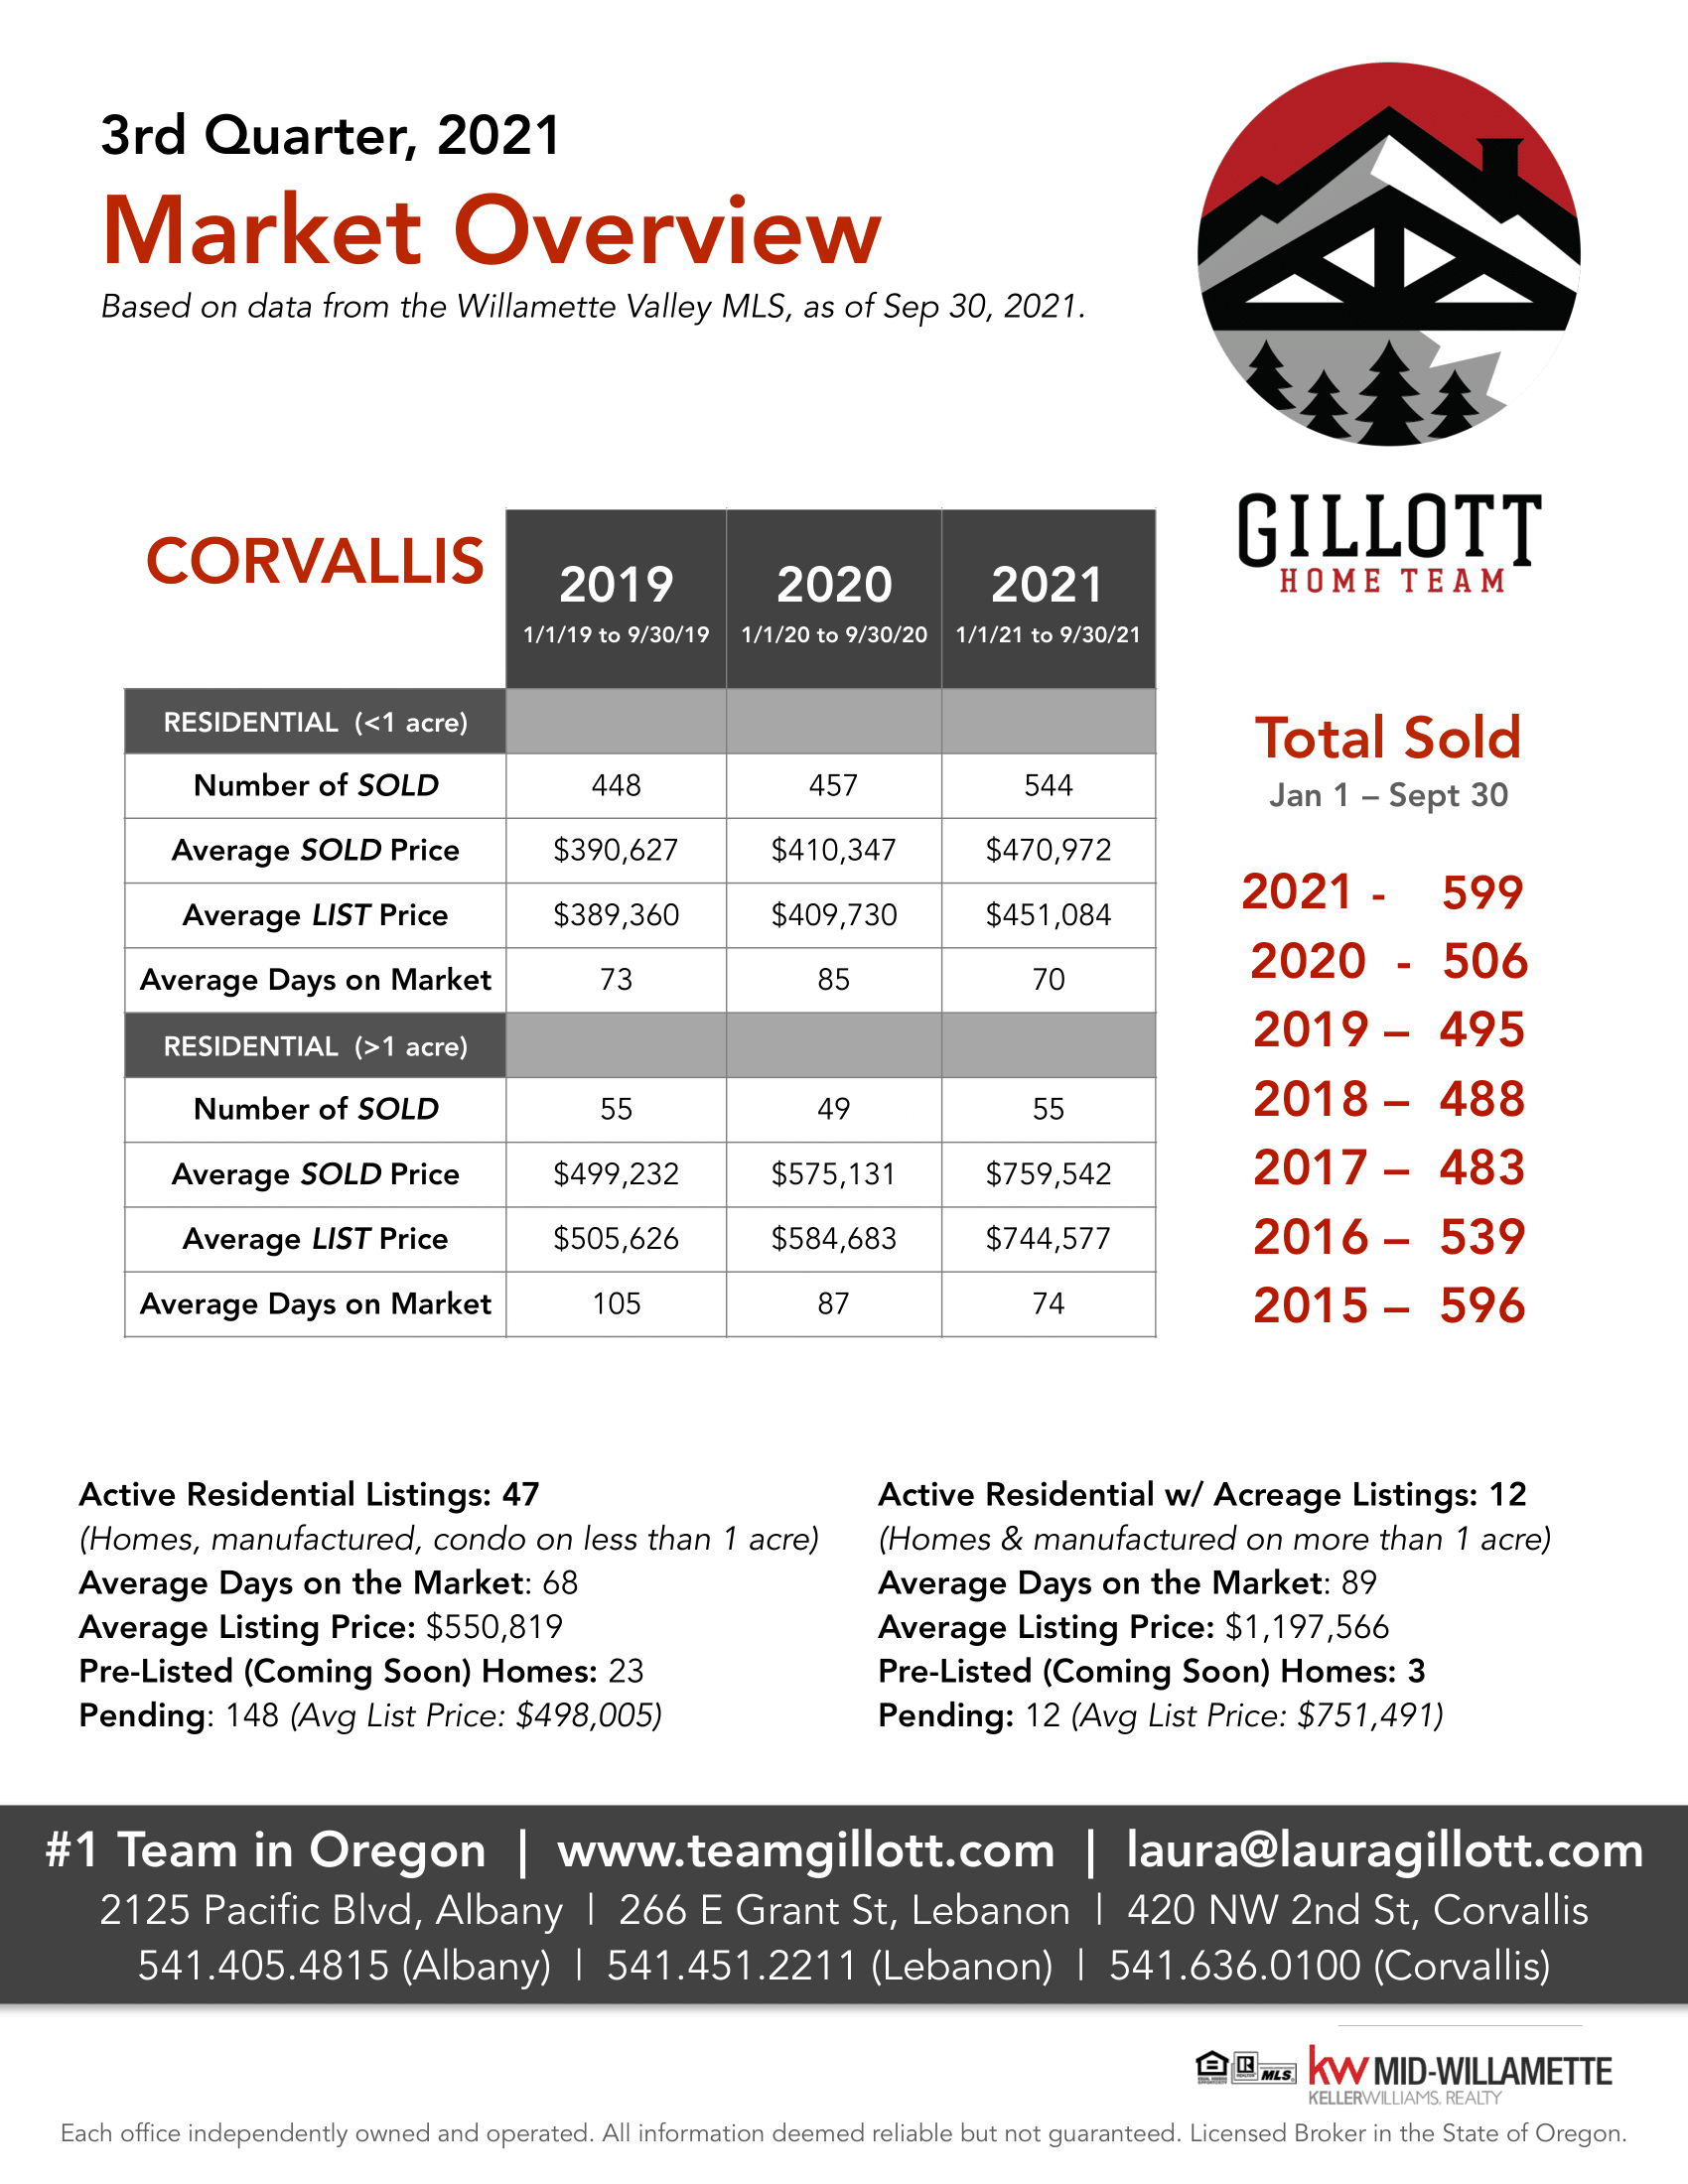 3rd Qtr-Corvallis.png